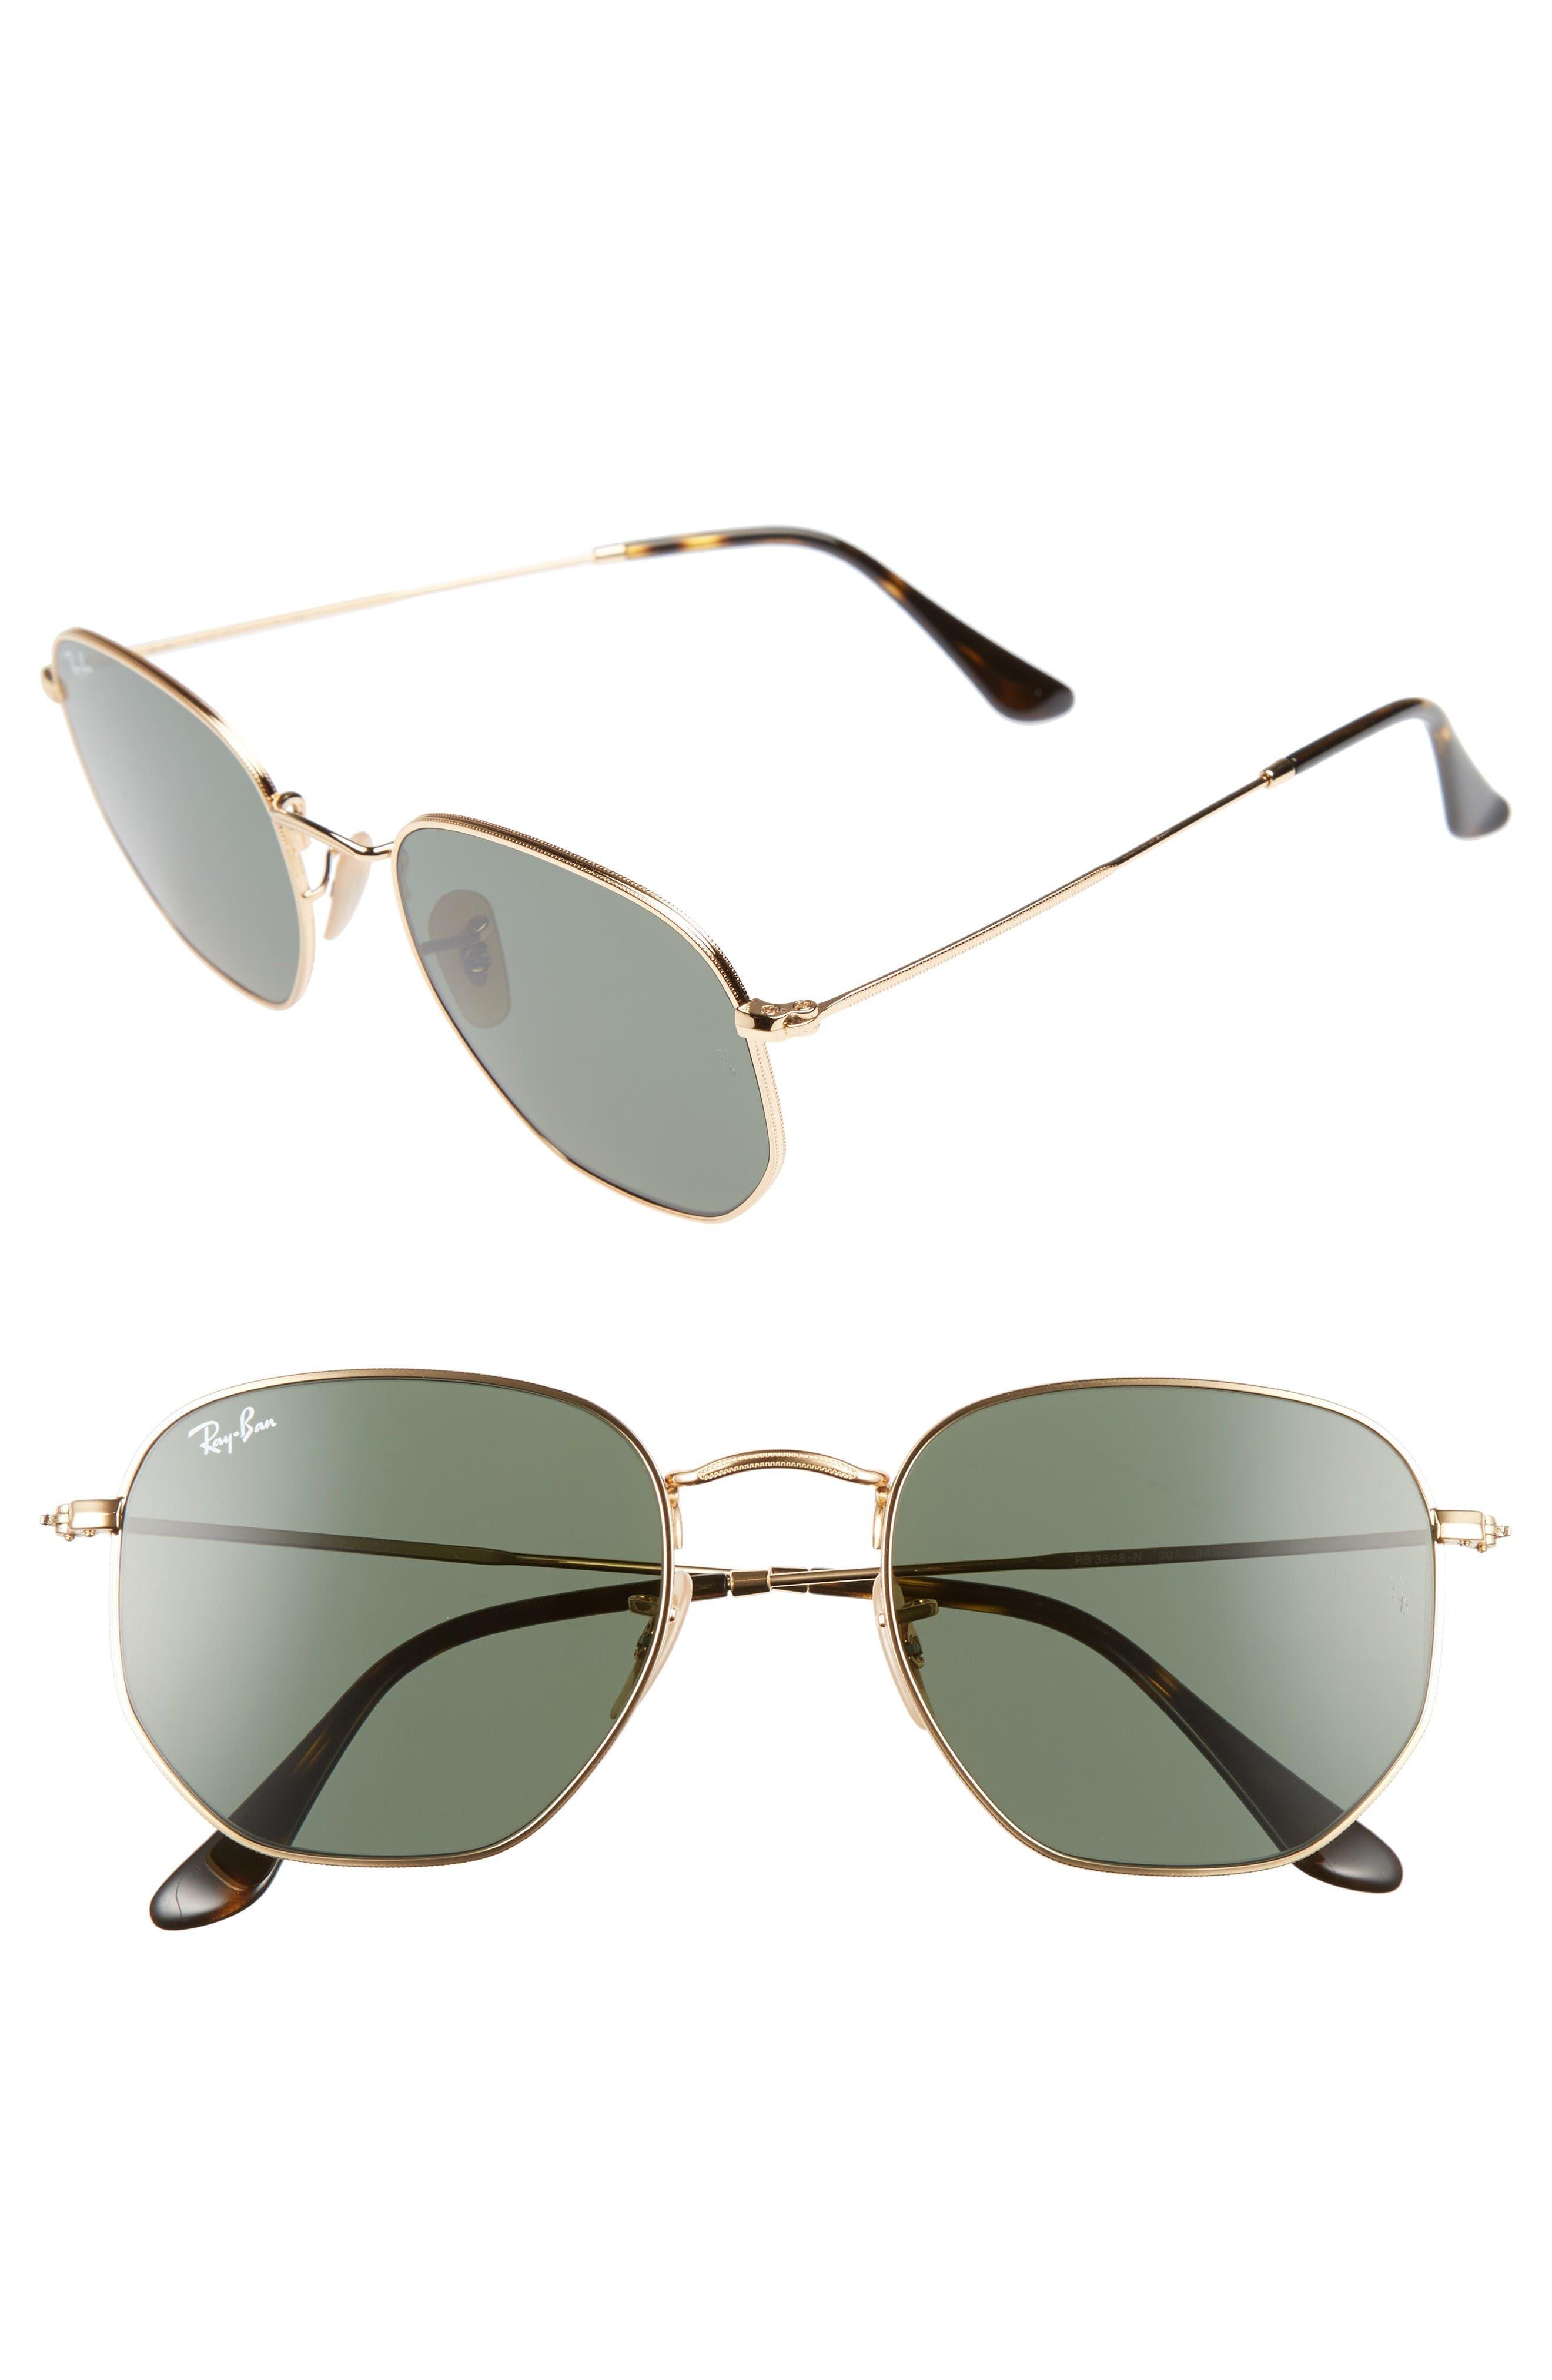 54mm Aviator Sunglasses,                             Main thumbnail 1, color,                             Gold/ Green